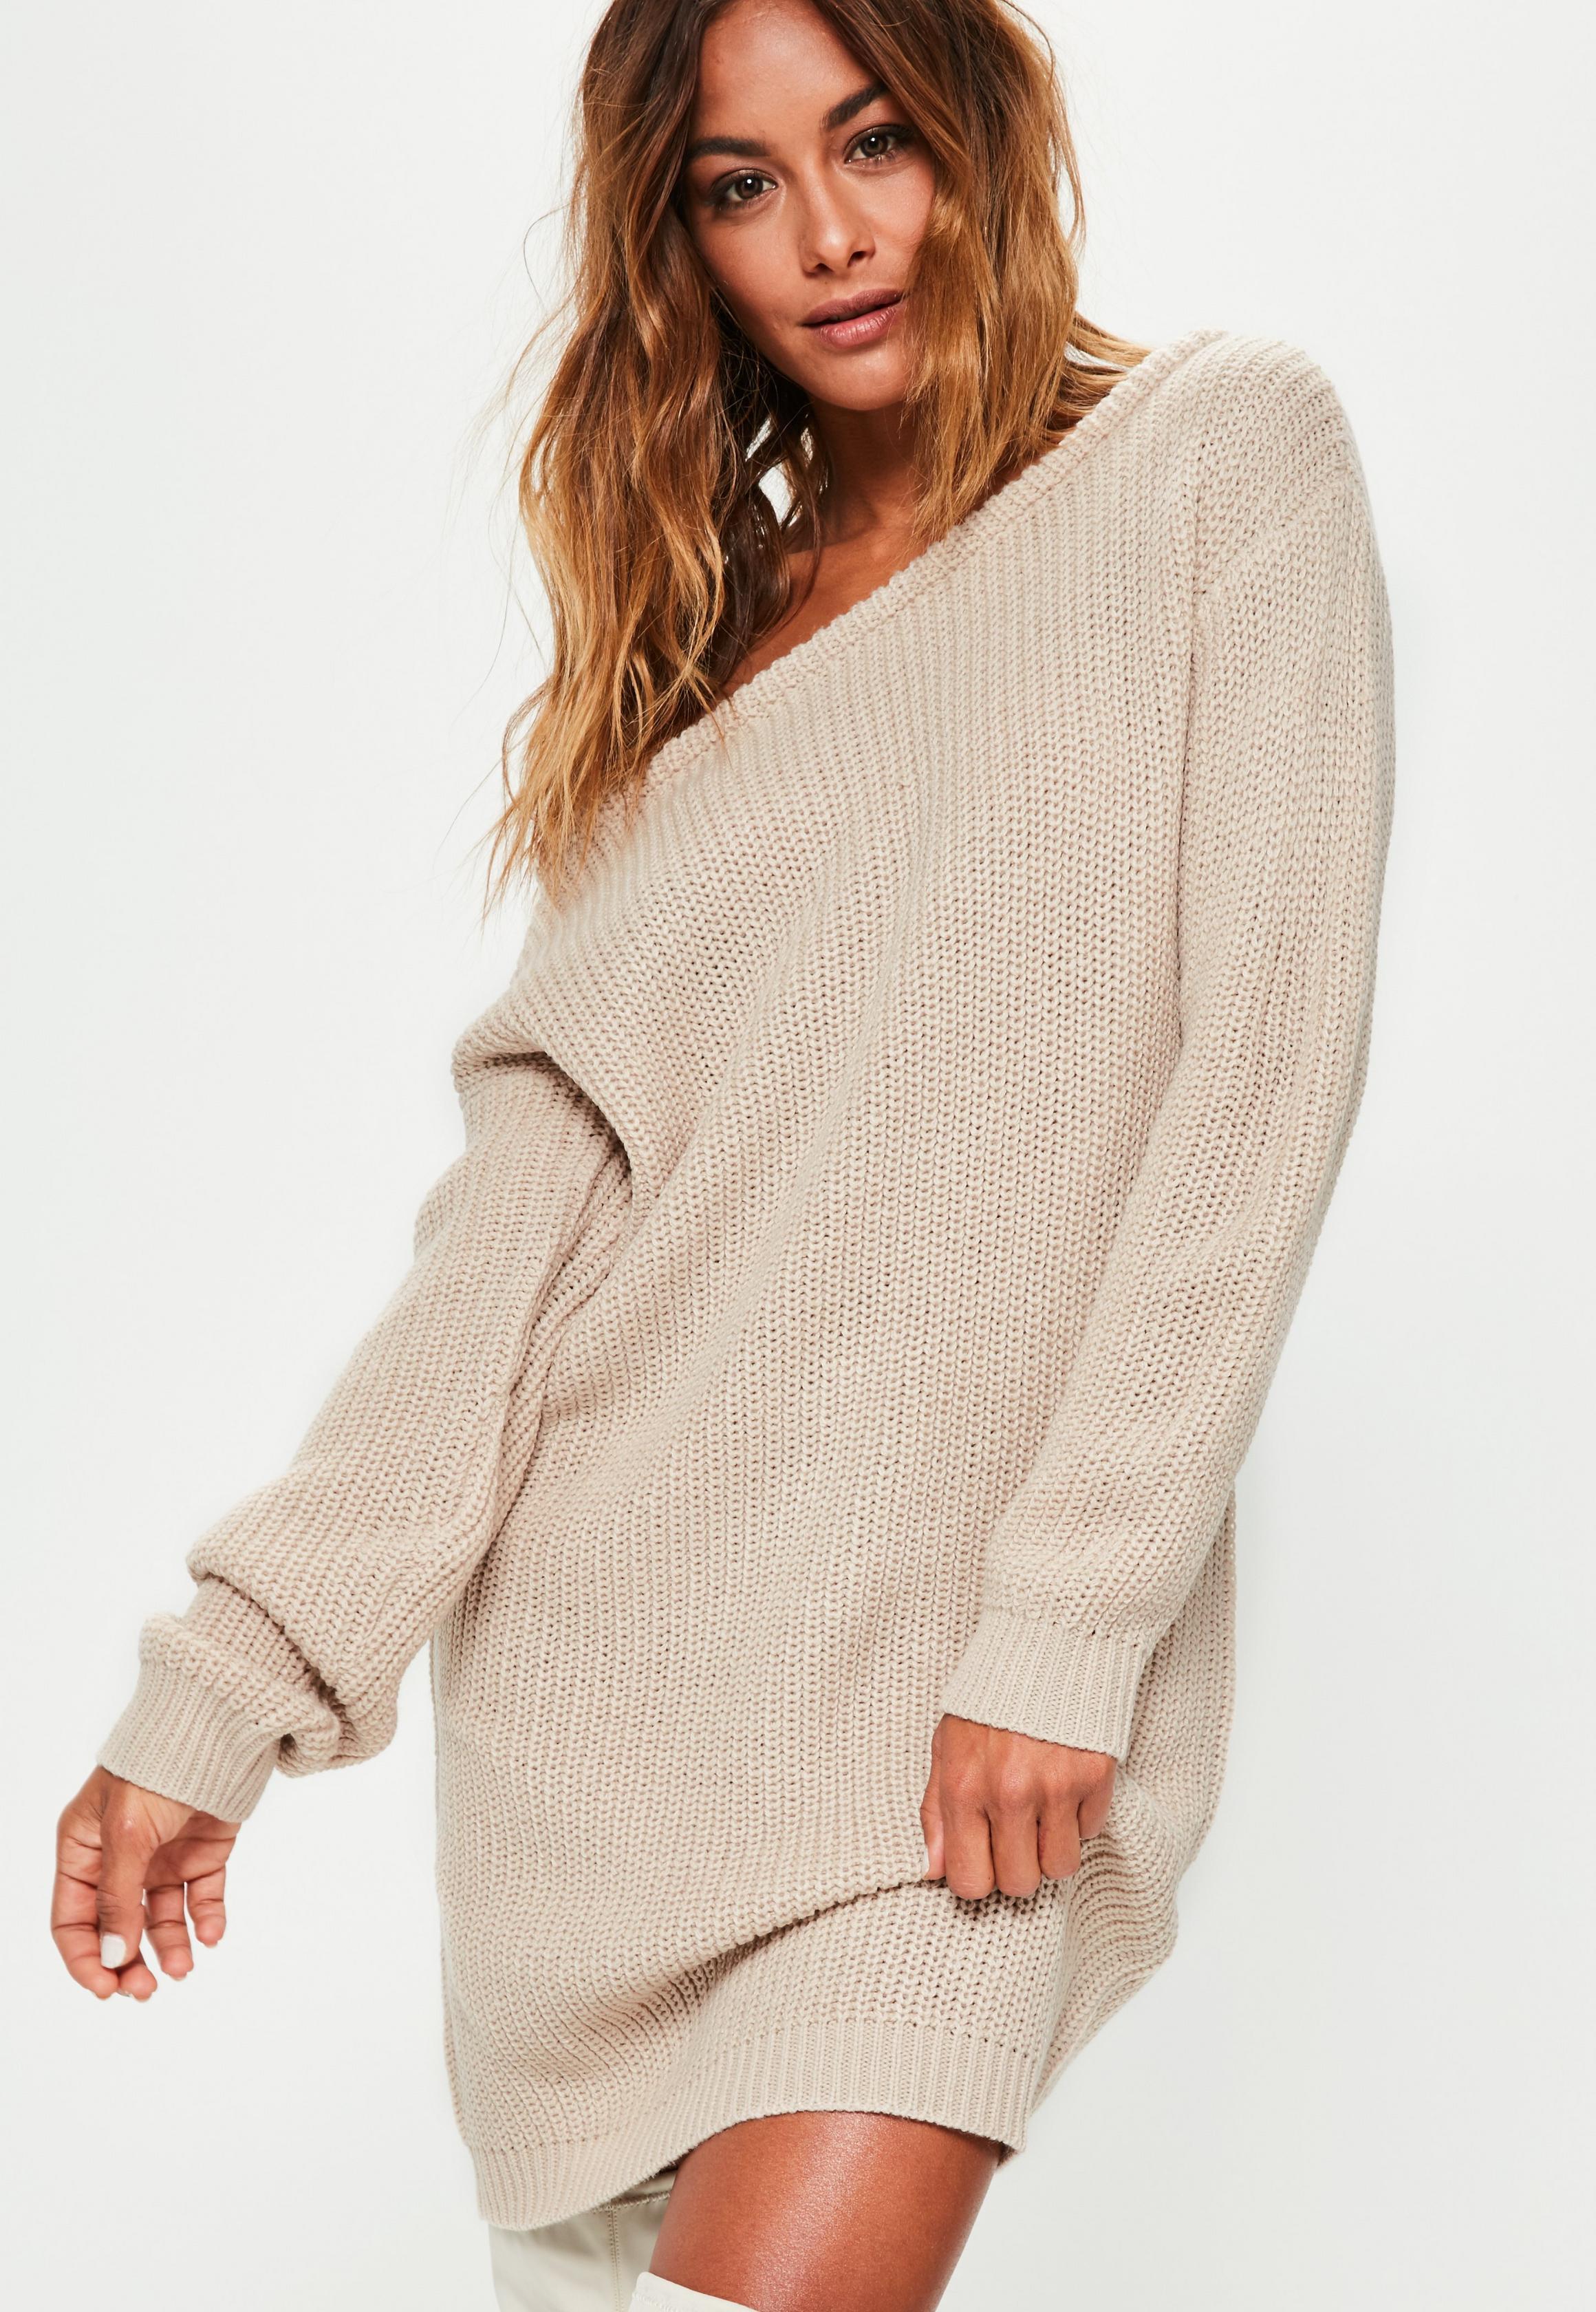 beige-off-shoulder-knitted-sweater-dress.jpg